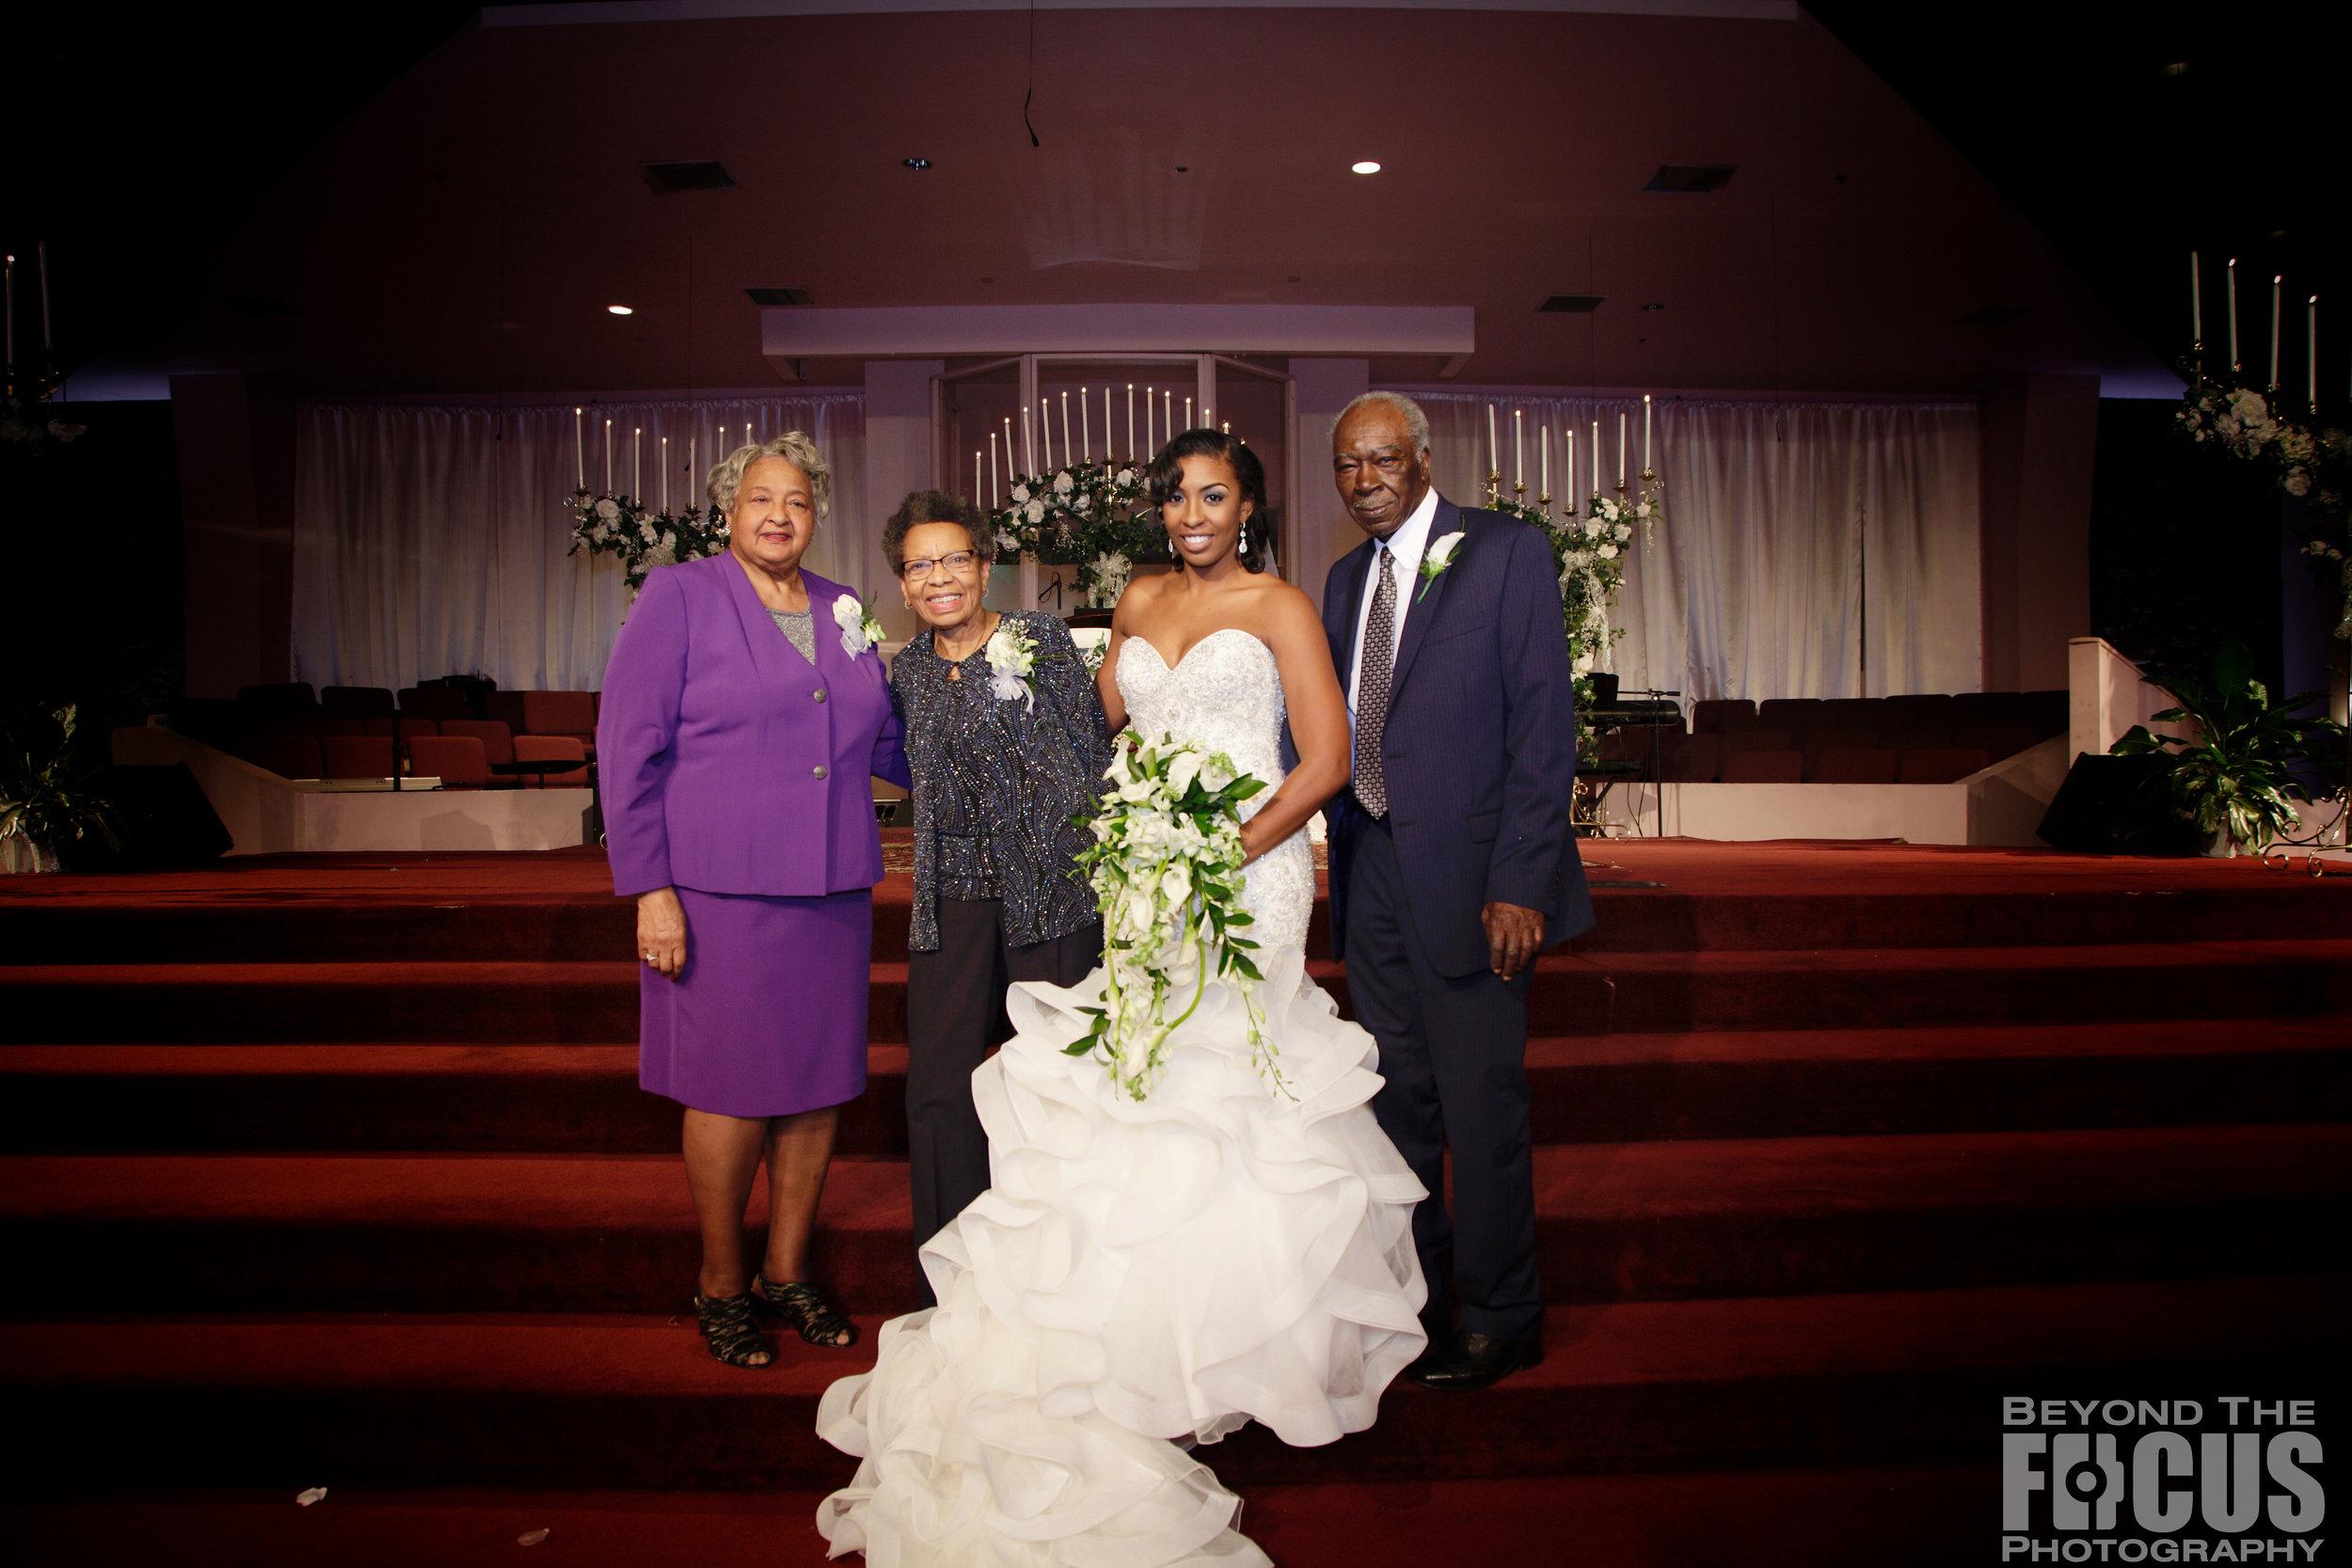 Matthews_Wedding_Ceremony_143.jpg